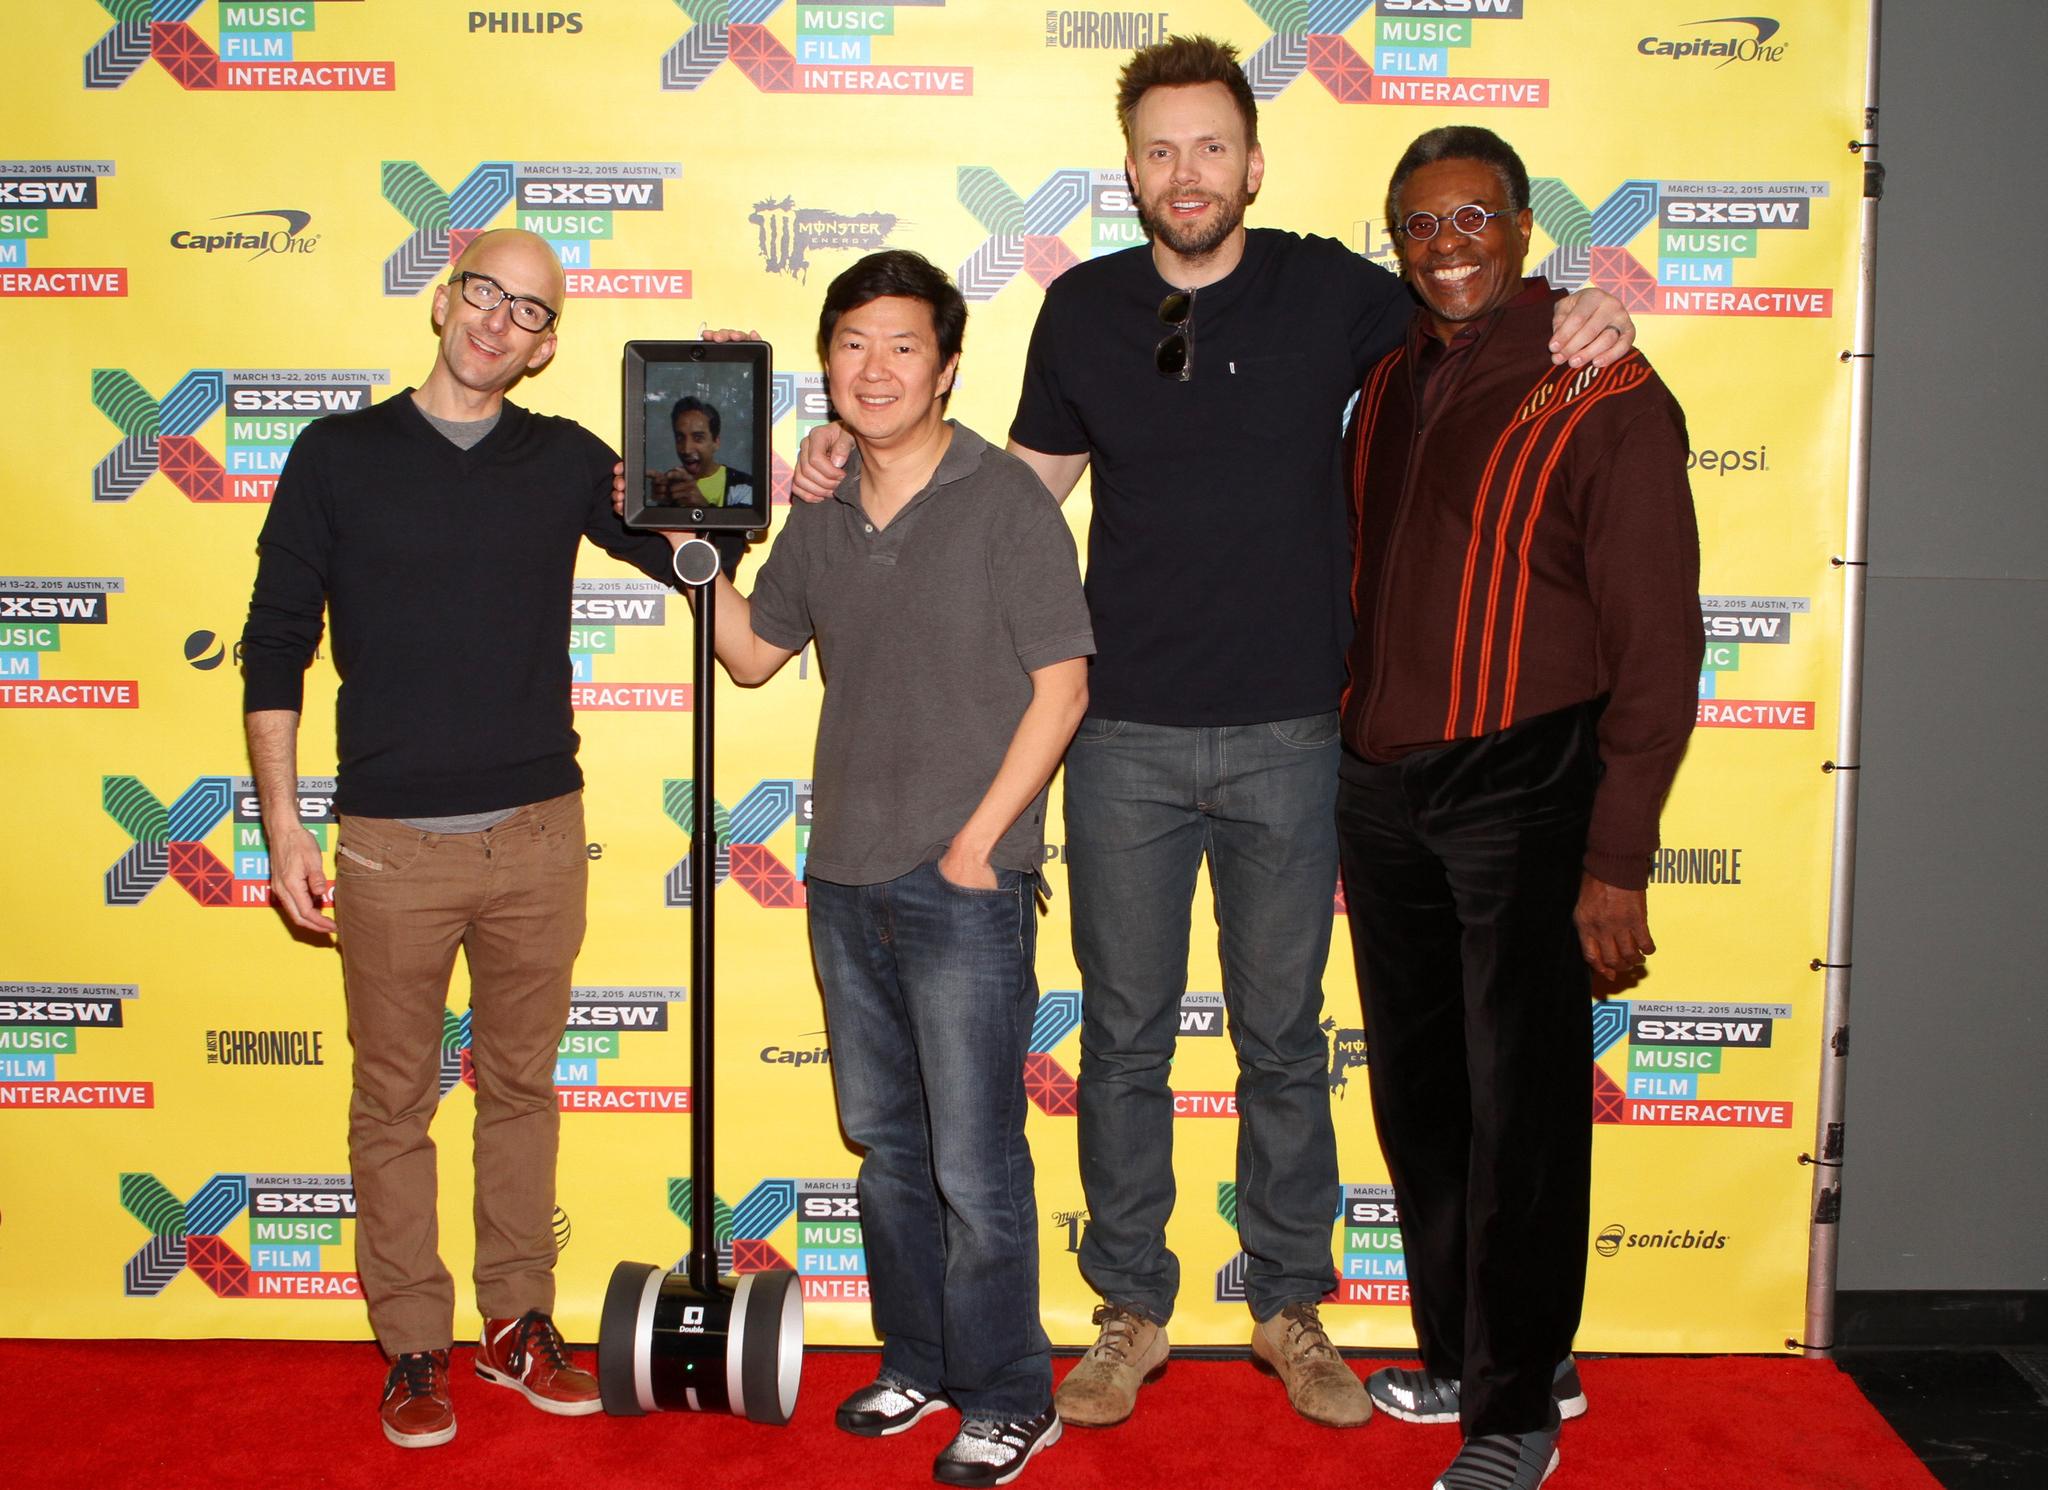 Keith David, Ken Jeong, Joel McHale, Jim Rash, and Danny Pudi at an event for Community (2009)